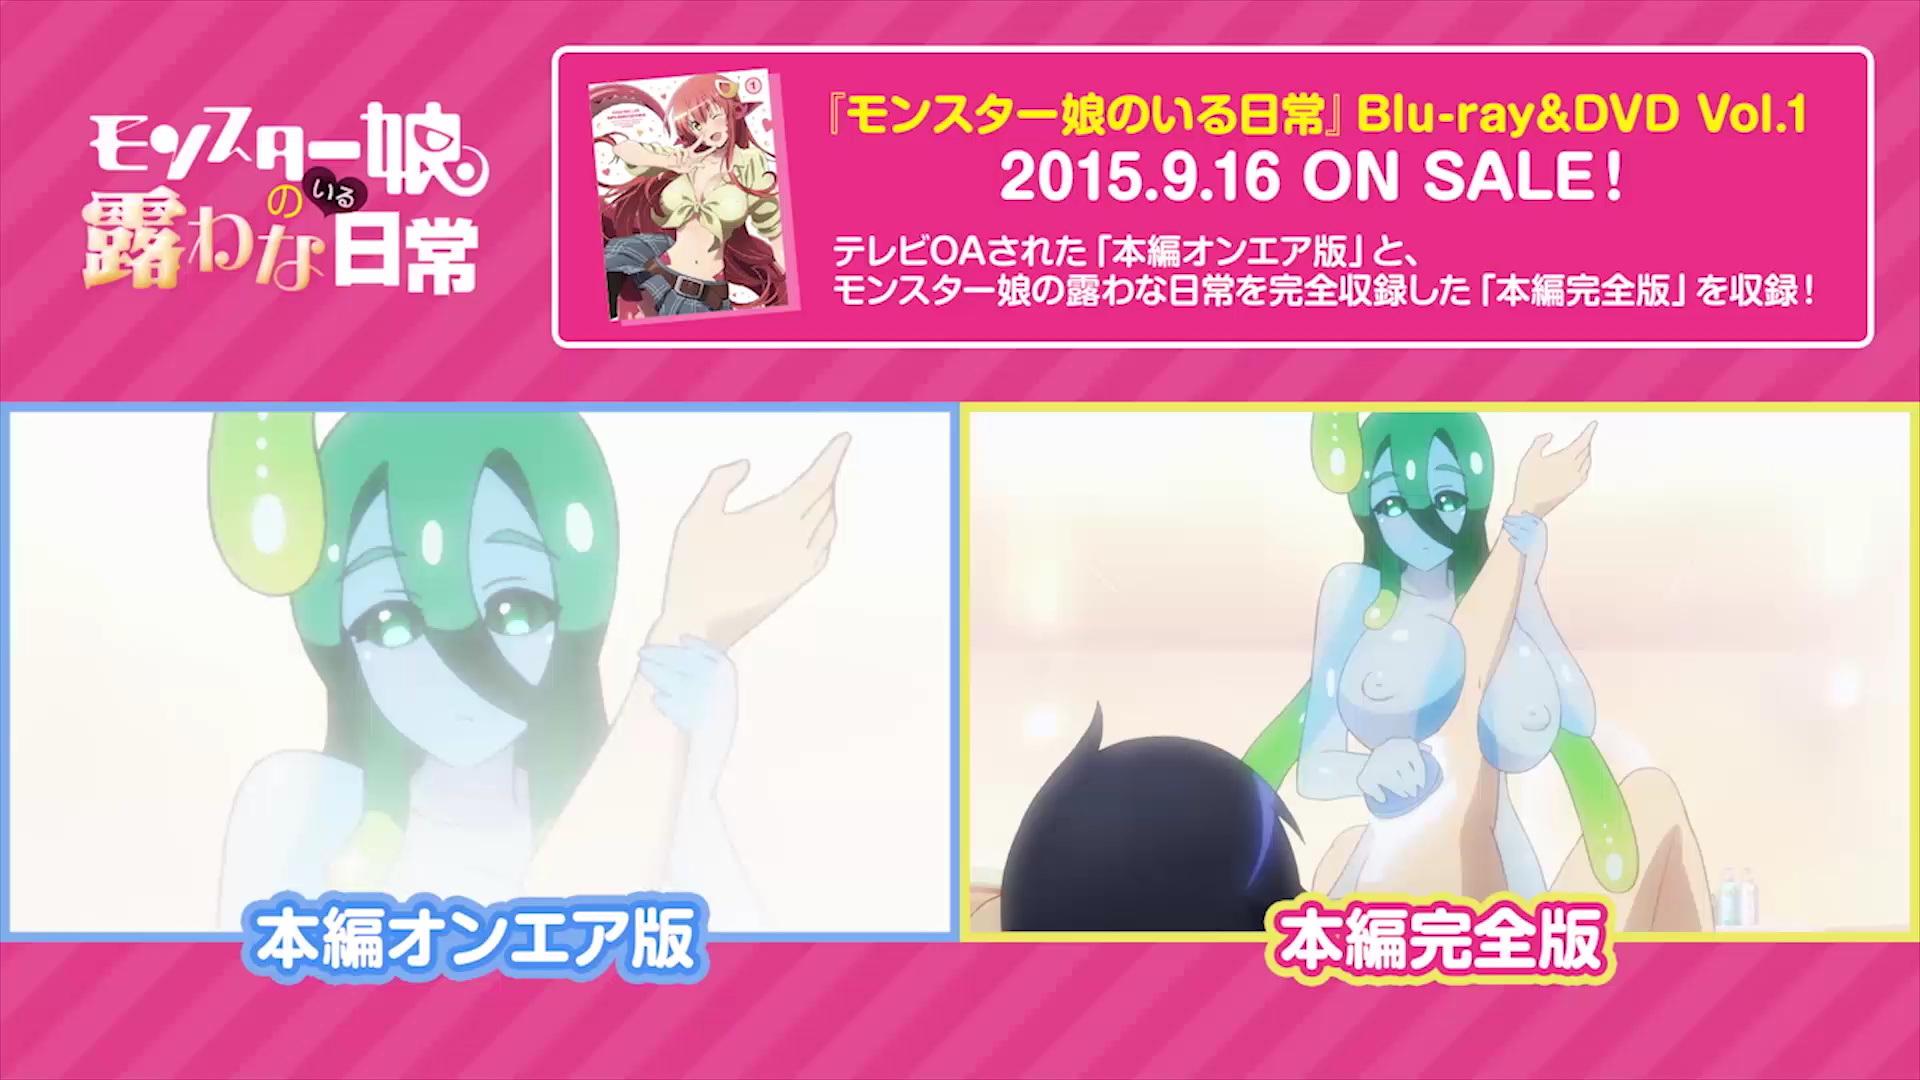 TV vs Blu-Ray Monster Musume anime blu-ray volume 1 uncensored 12